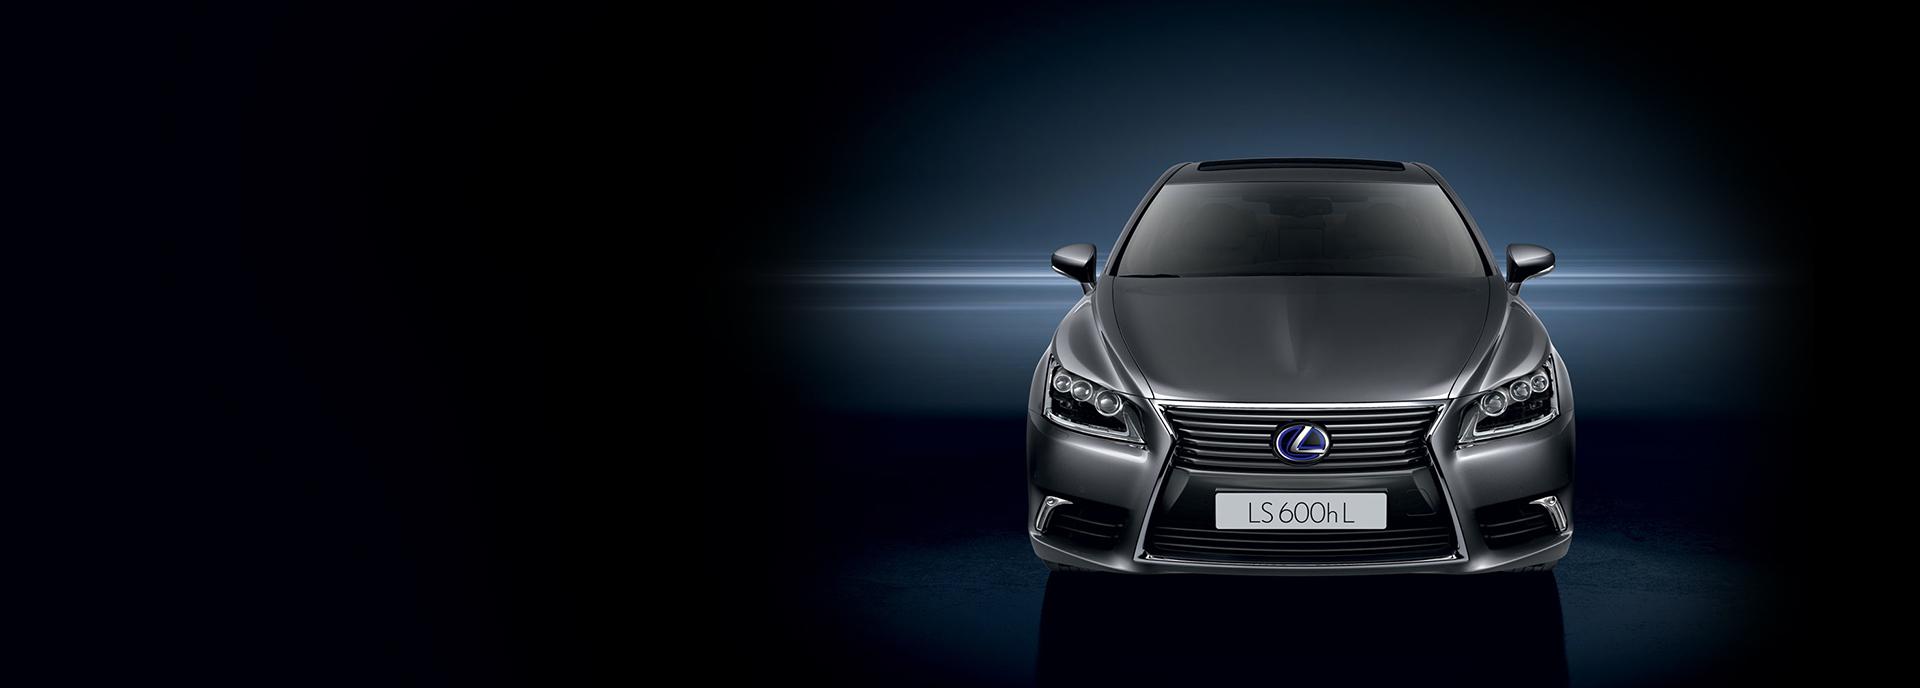 Lexus LS 600h L Hybrid hero